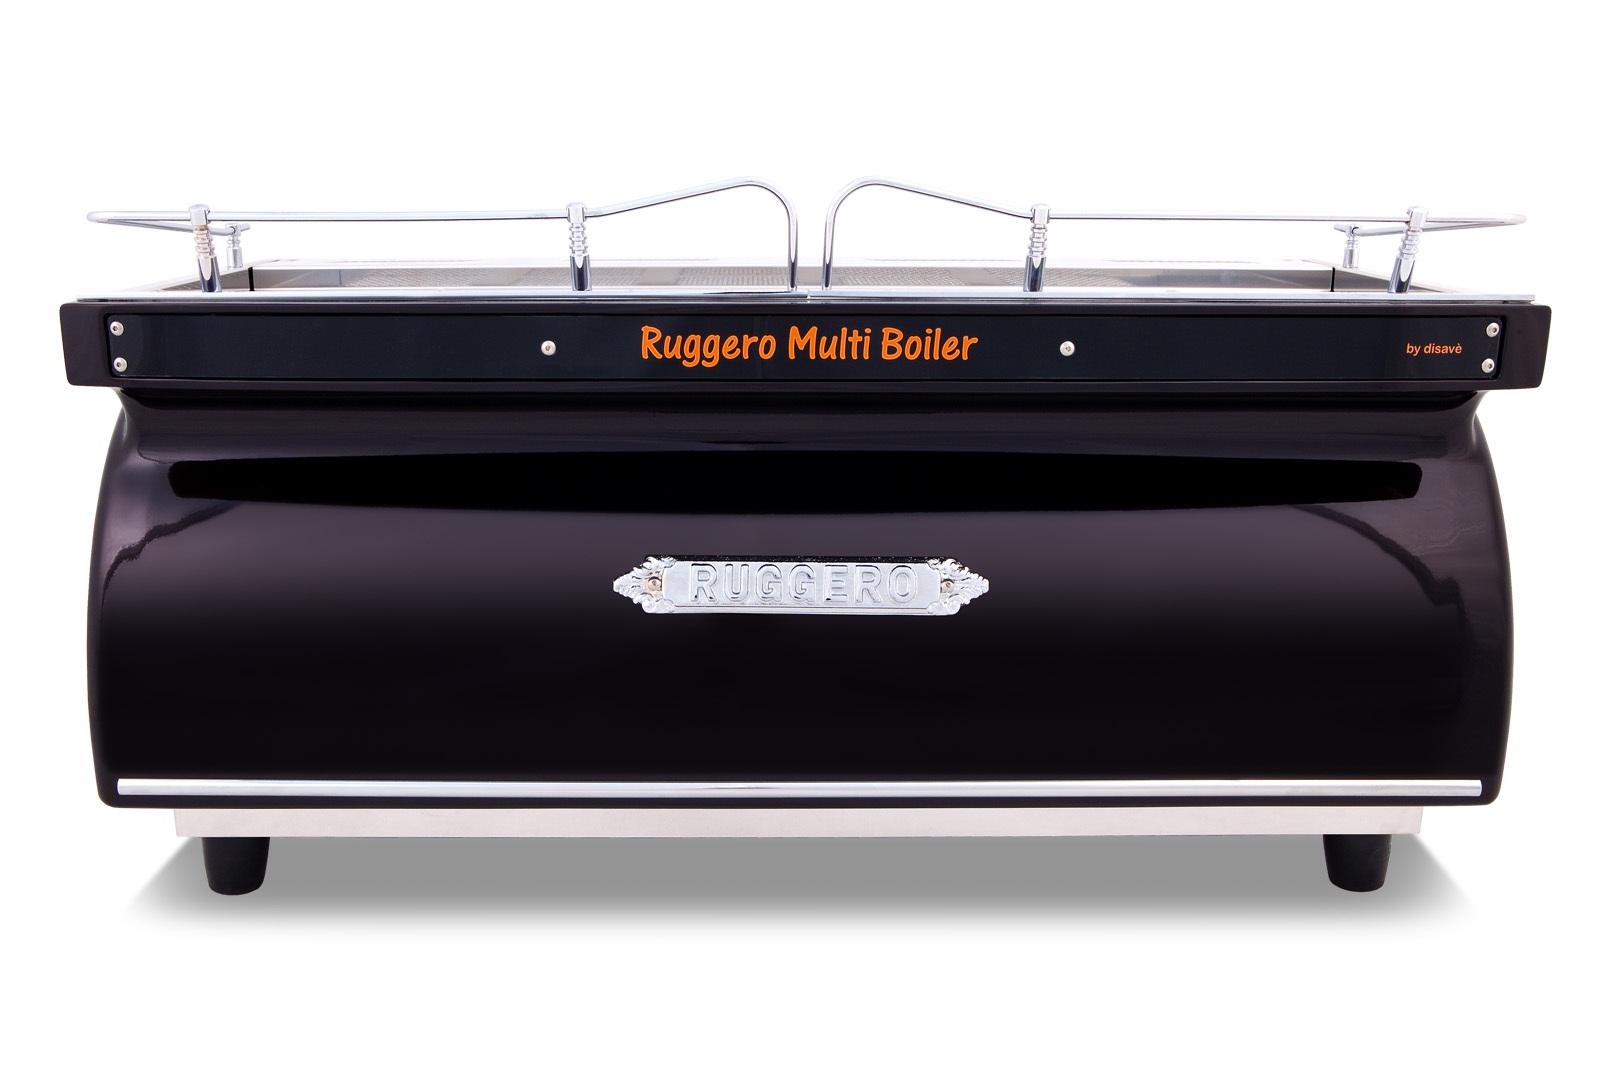 3 Group Ruggero Multi Boiler Disav 232 Espresso Equipment